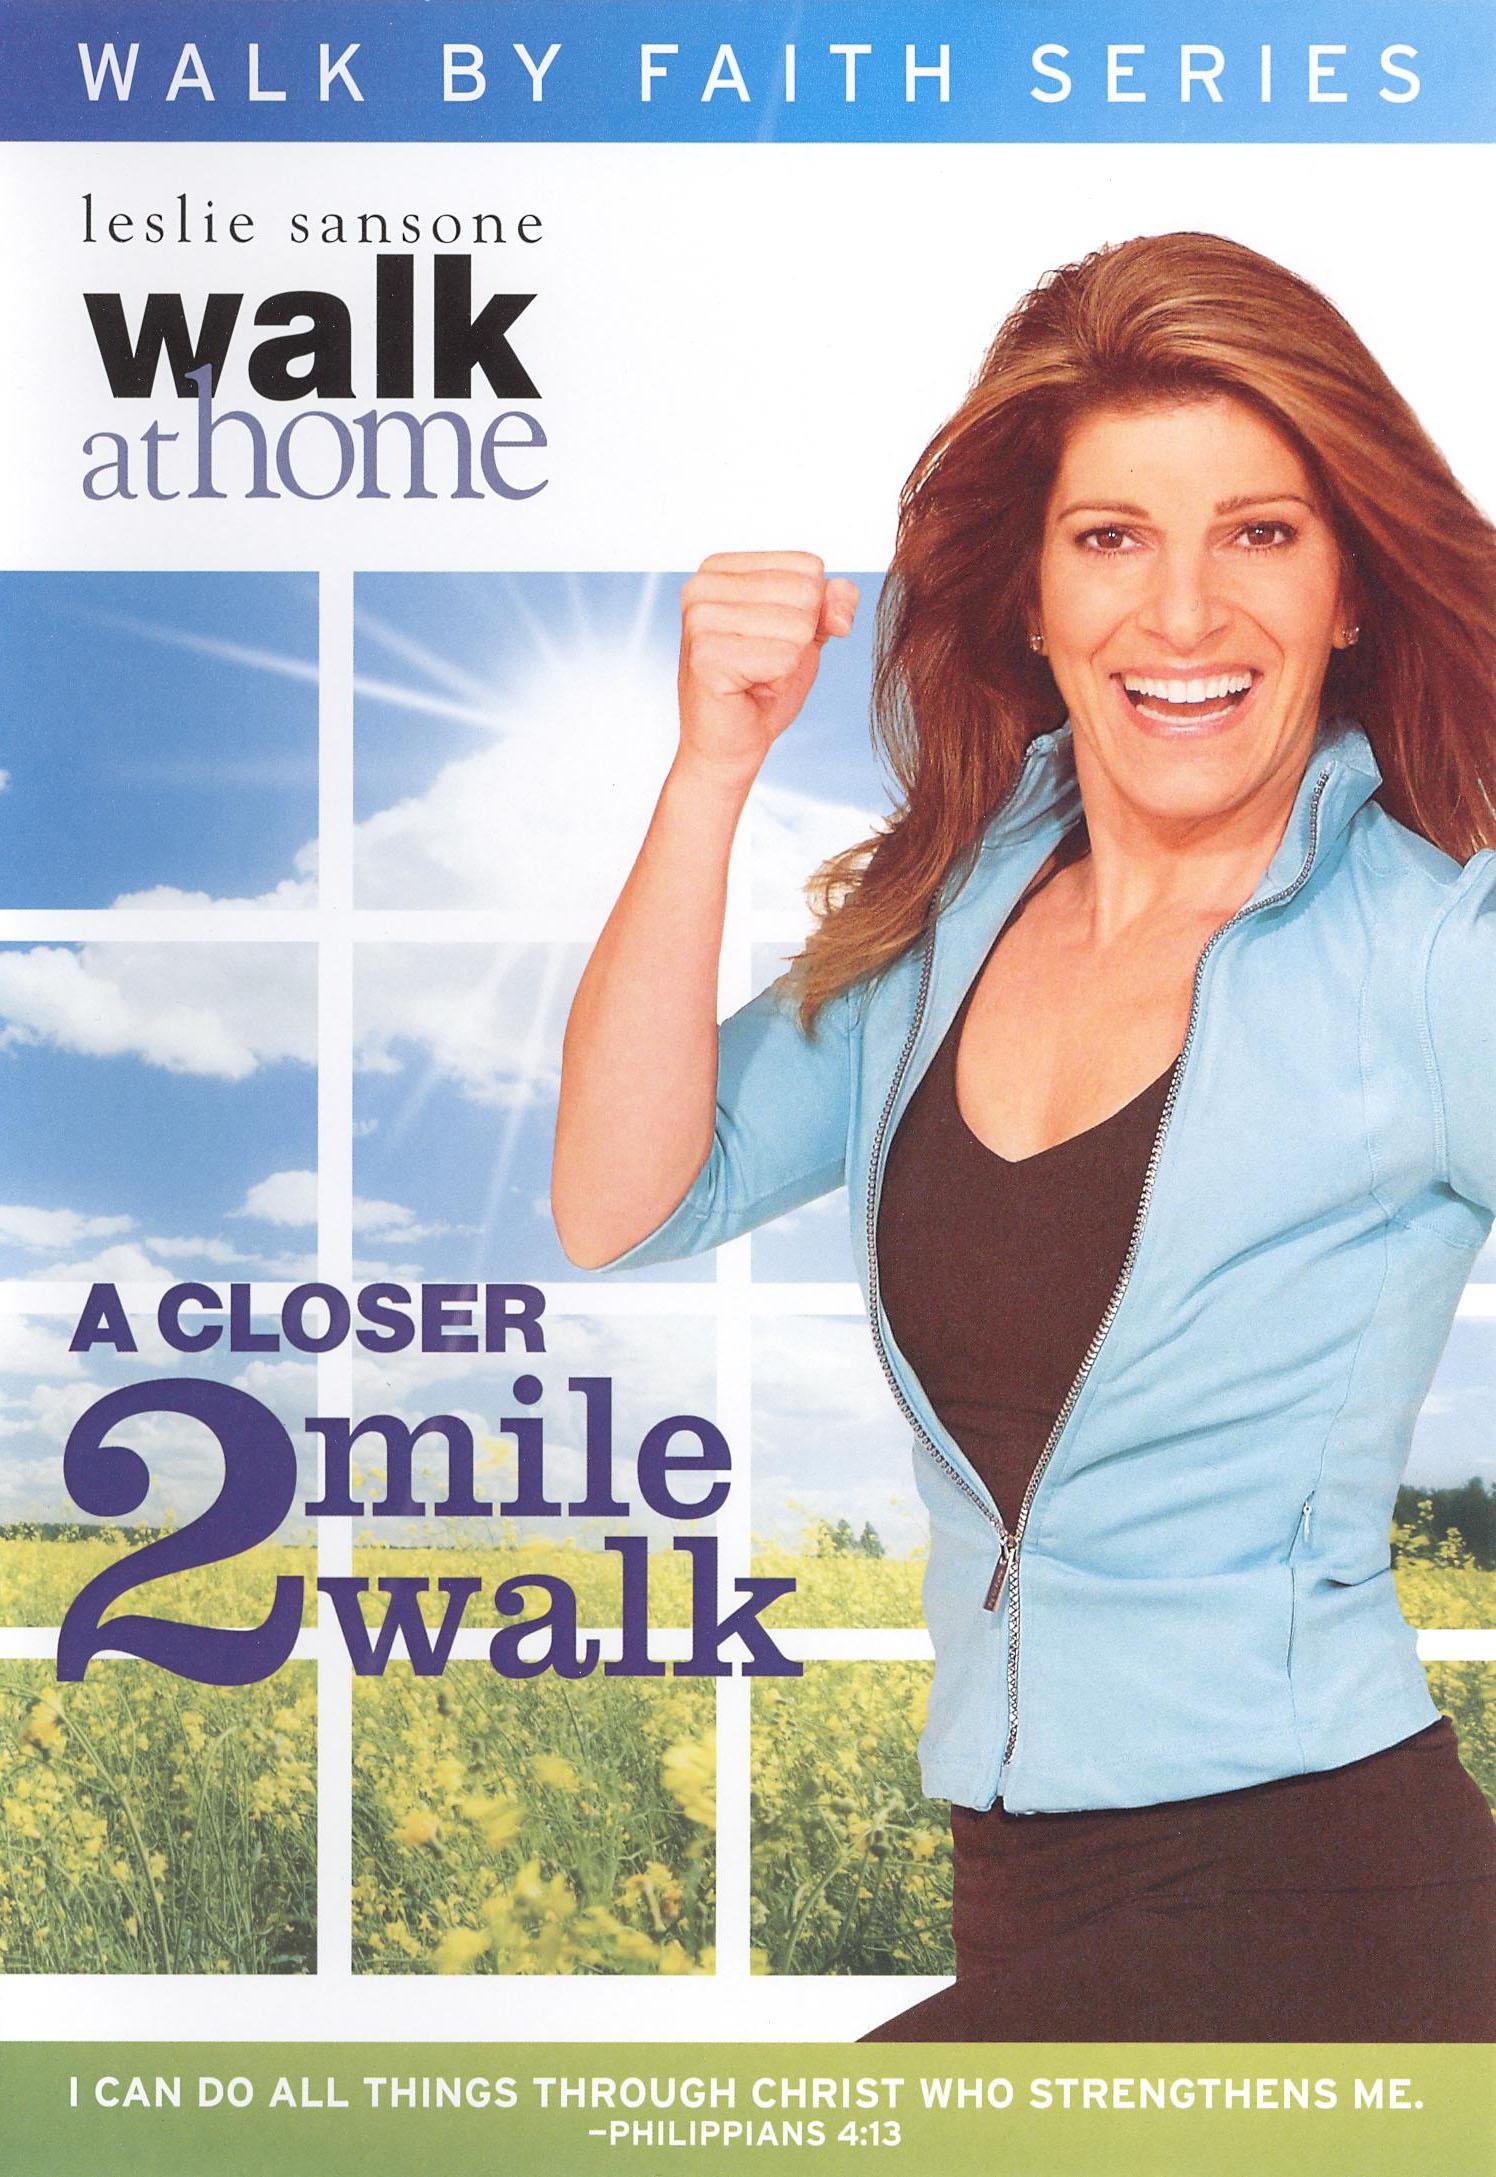 Leslie Sansone: Walk at Home - A Closer 2 Mile Walk